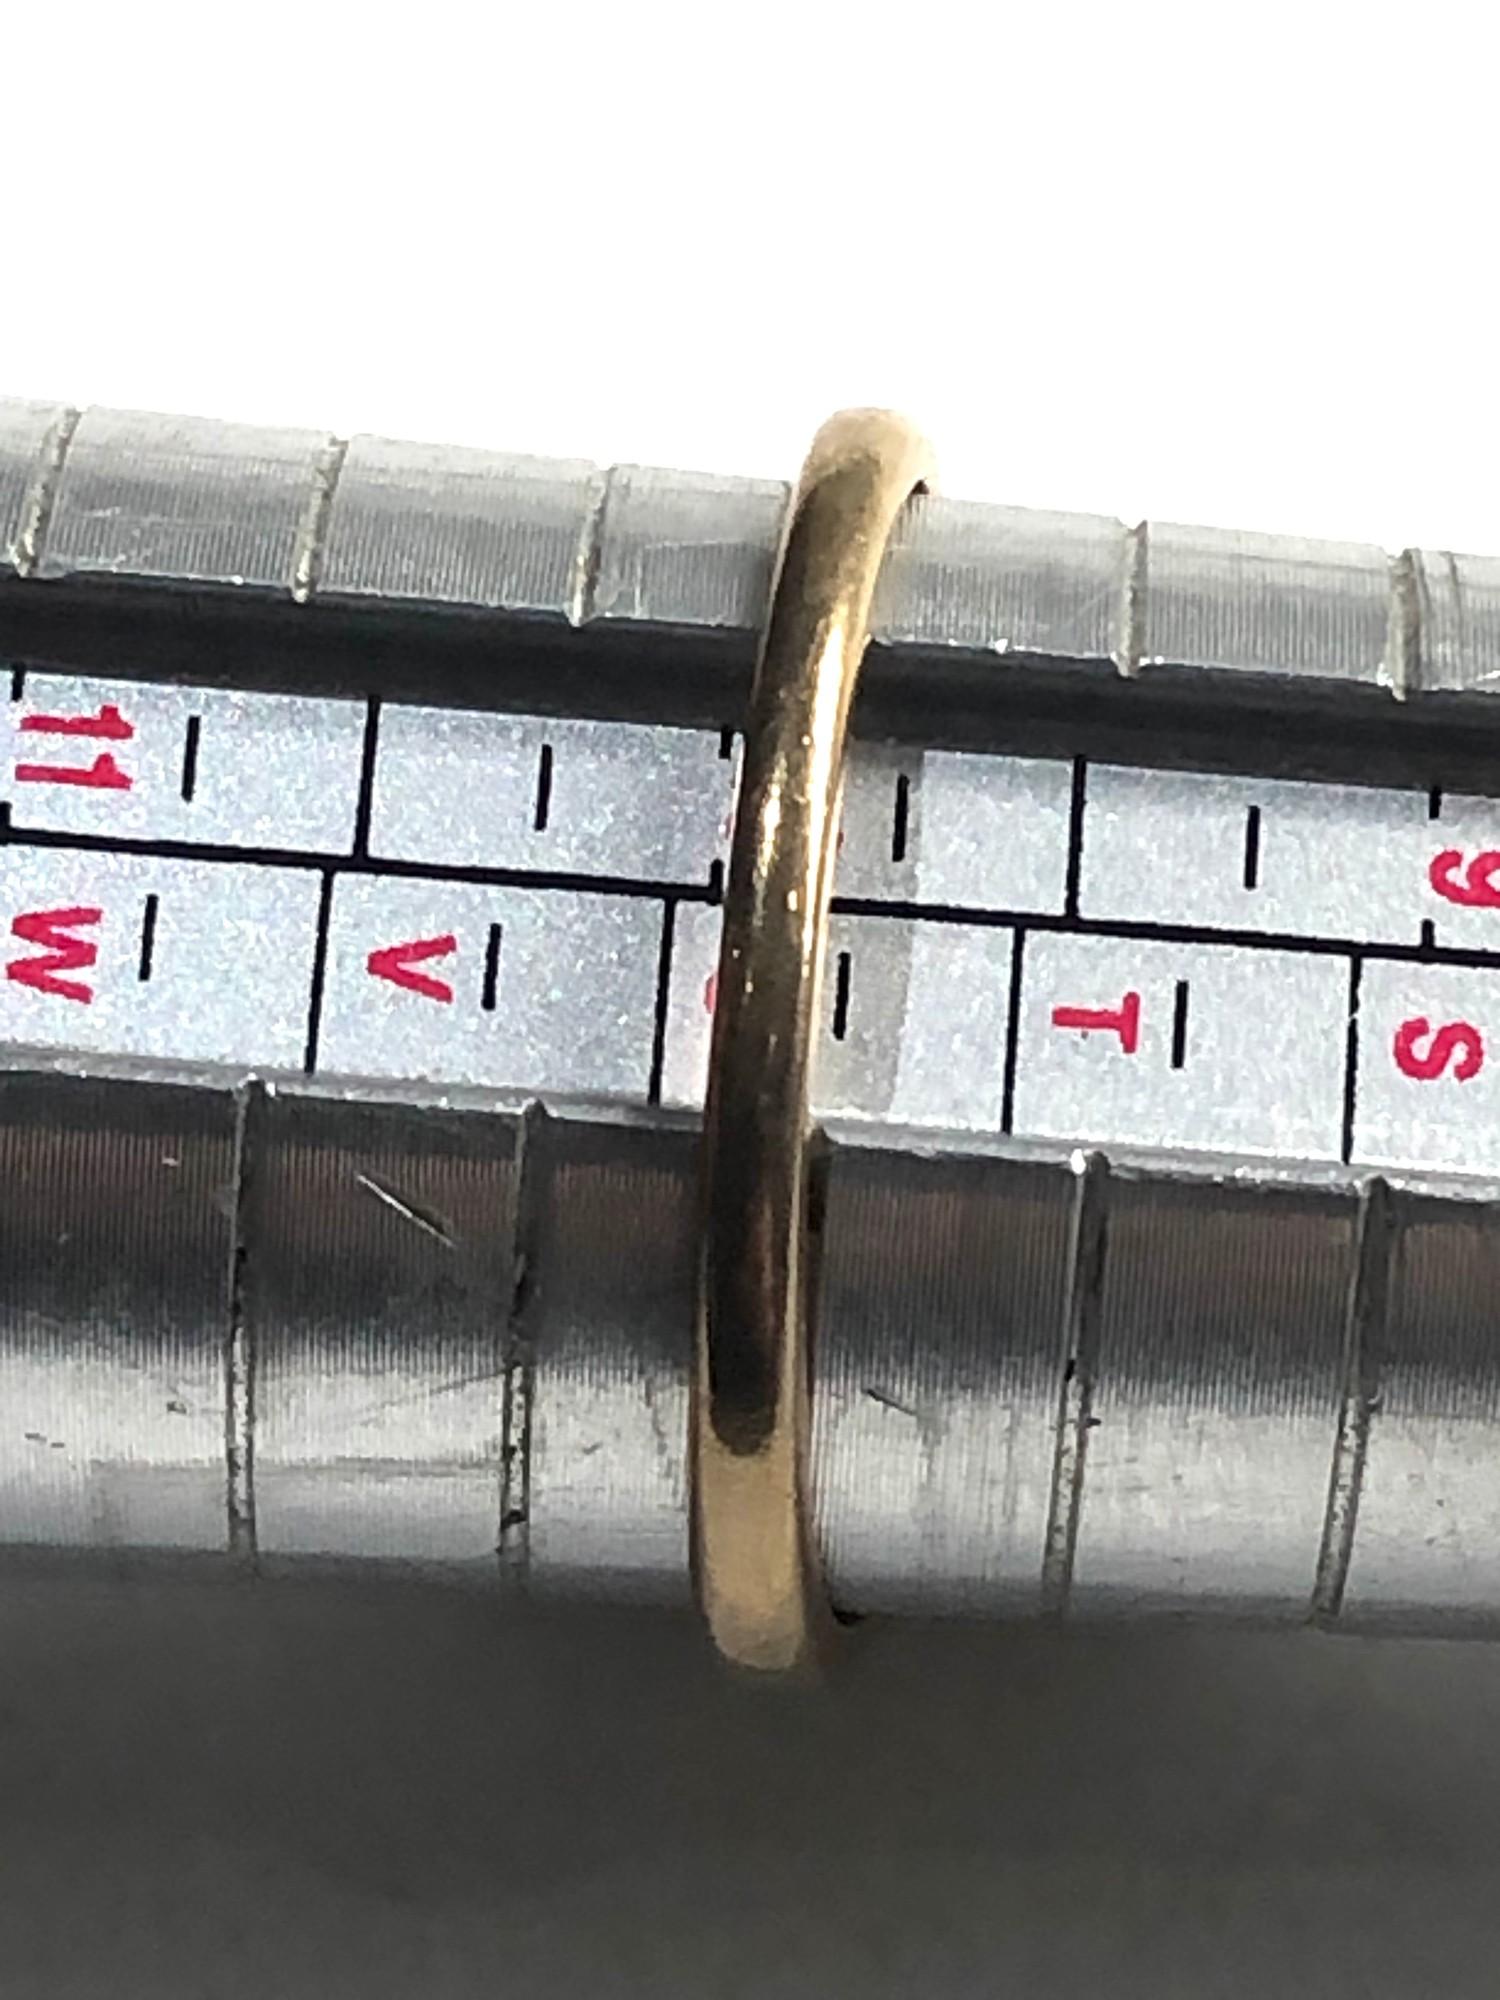 Vintage 9ct Gold ruby ring w/ diamond detail 4g - Image 3 of 3